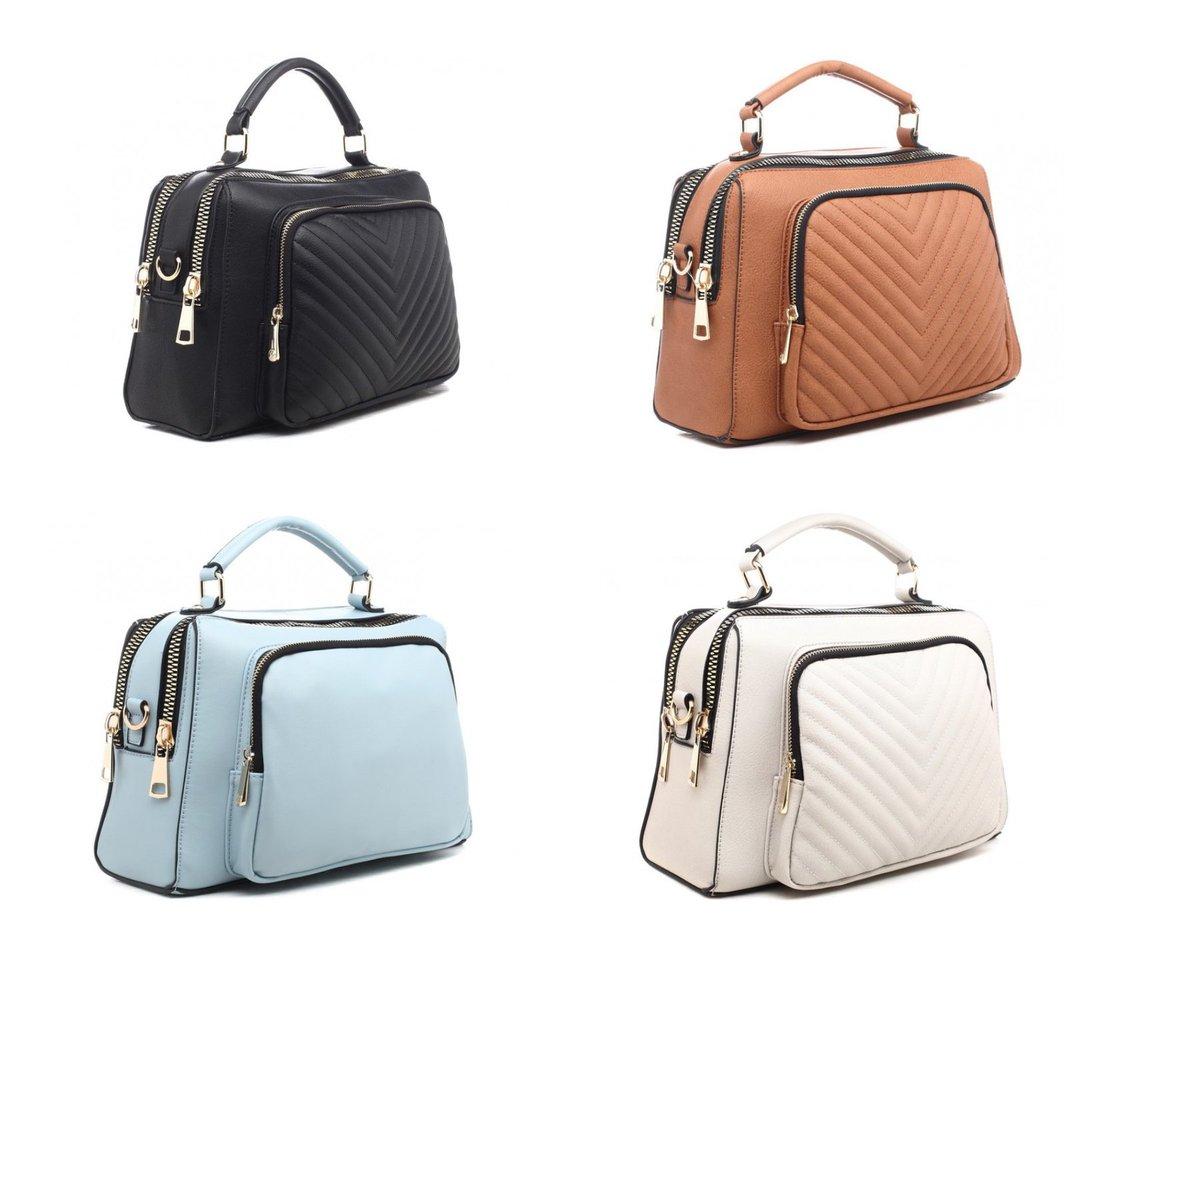 New Bessie London Handbags Fashion Stylish Retweet Please Esuk Tweeturbiz Wnukrt Fpsbs Flockbn Sbutd Womaninbiz Ukhashtags